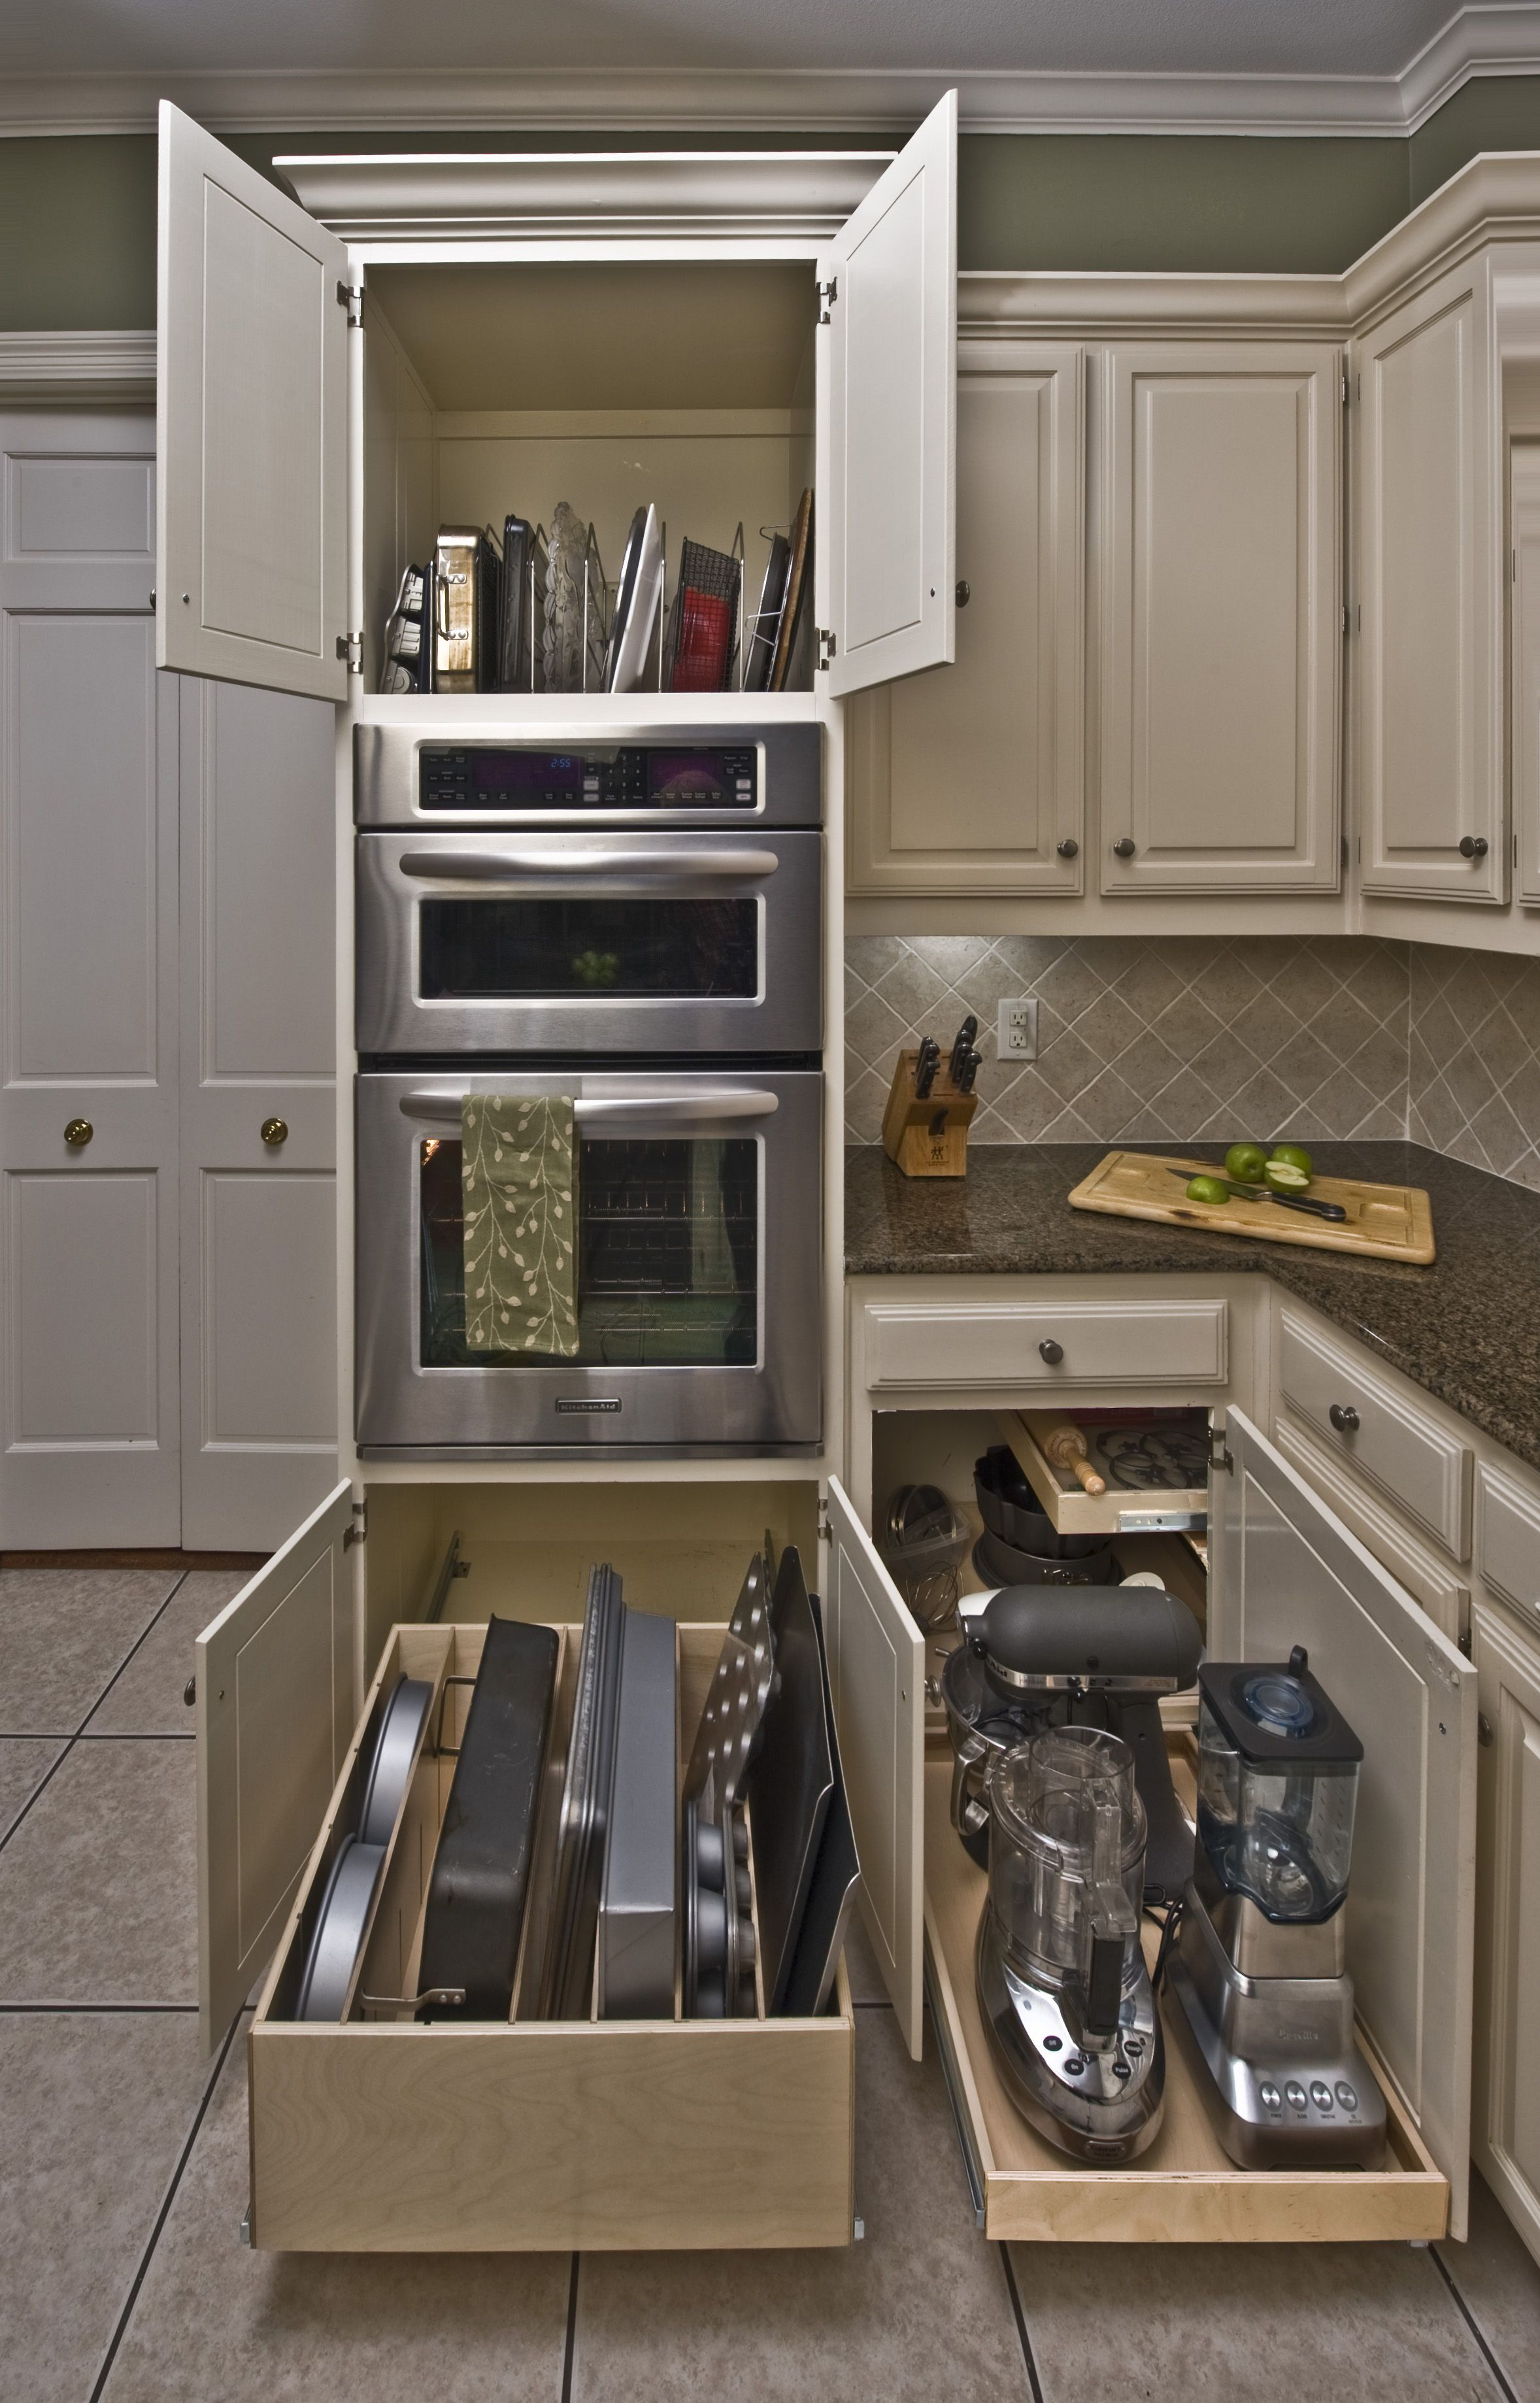 improving your kitchen shelves in alexandria kitchen cabinet design best kitchen cabinets on kitchen cabinets organization layout id=98231